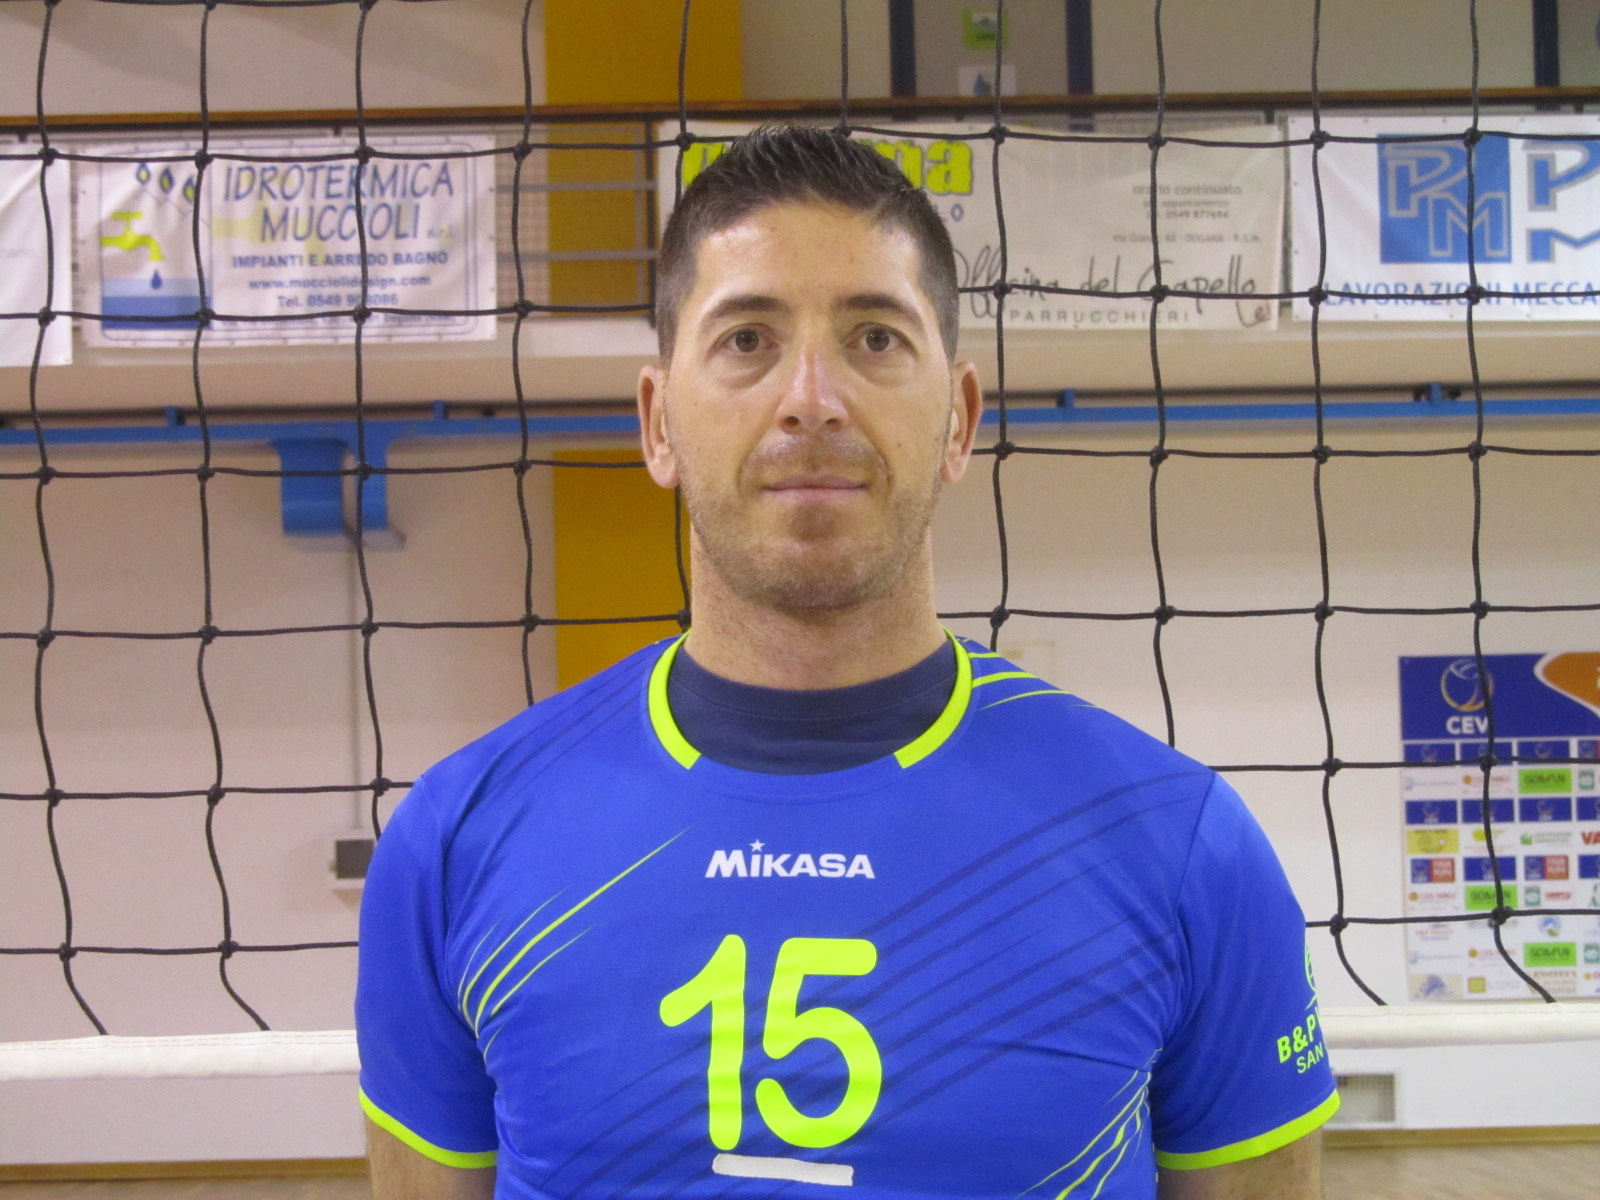 FrancescoTabariniOrizz